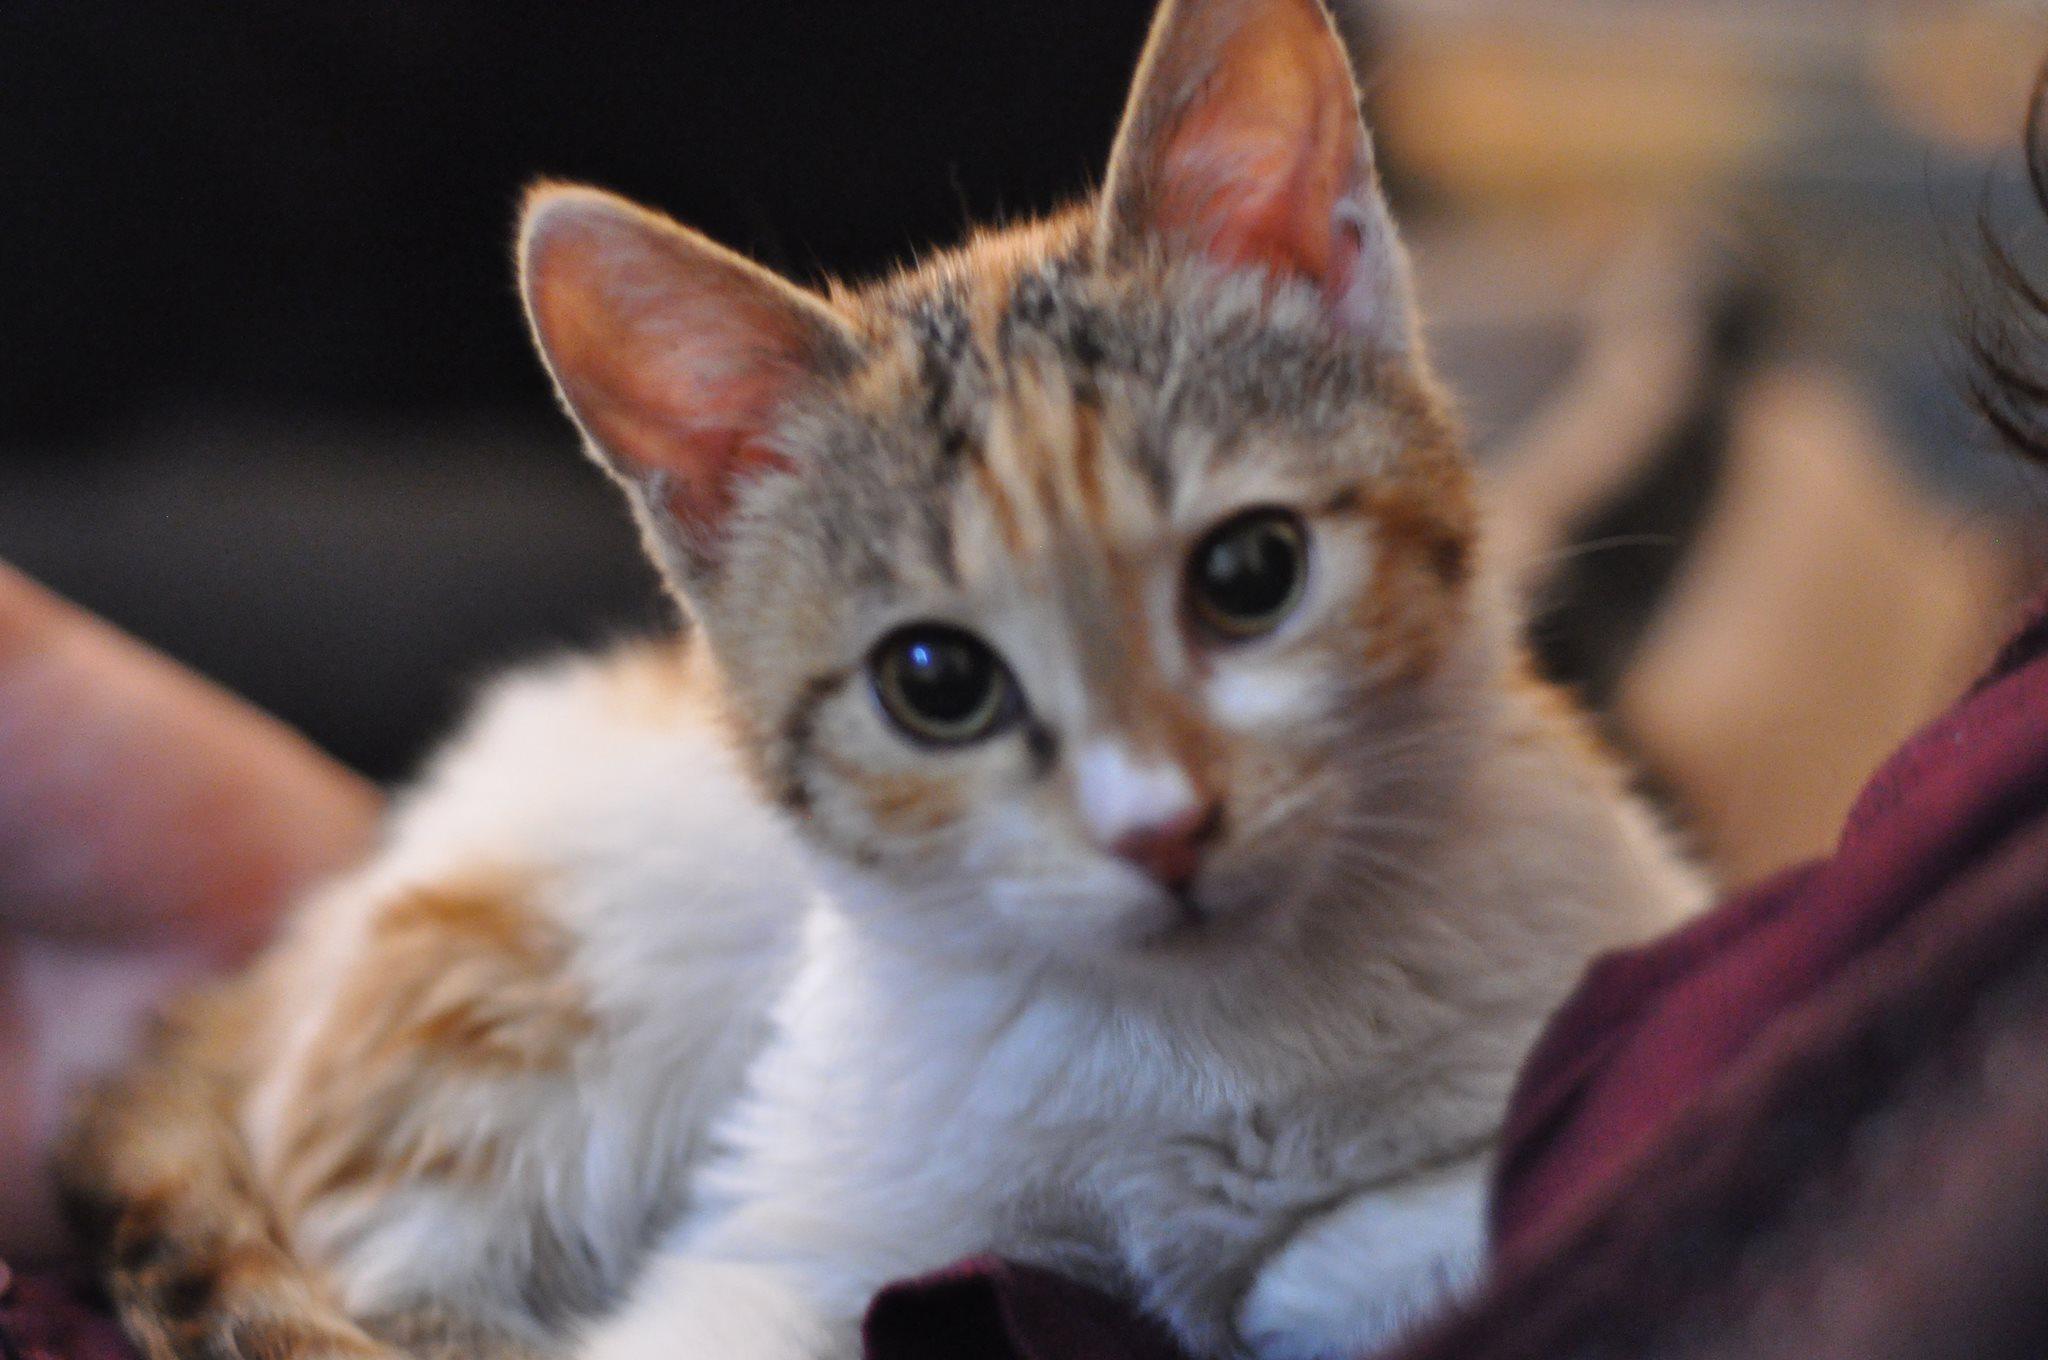 Acil kedi sahiplendirme